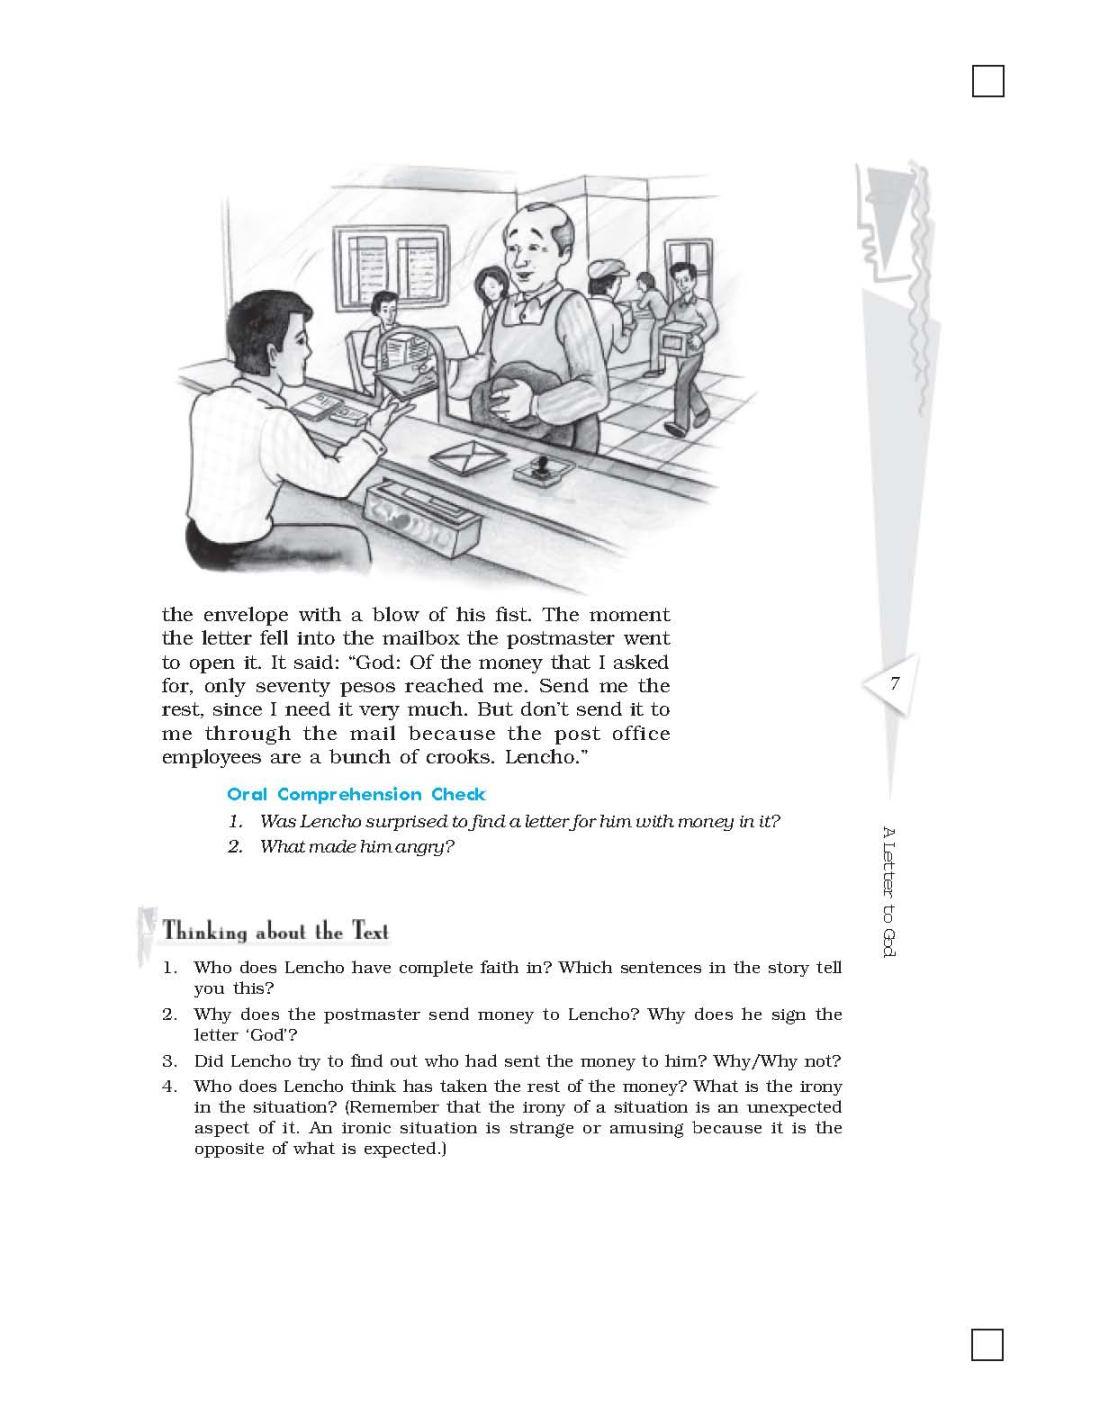 cbse class 8 science book